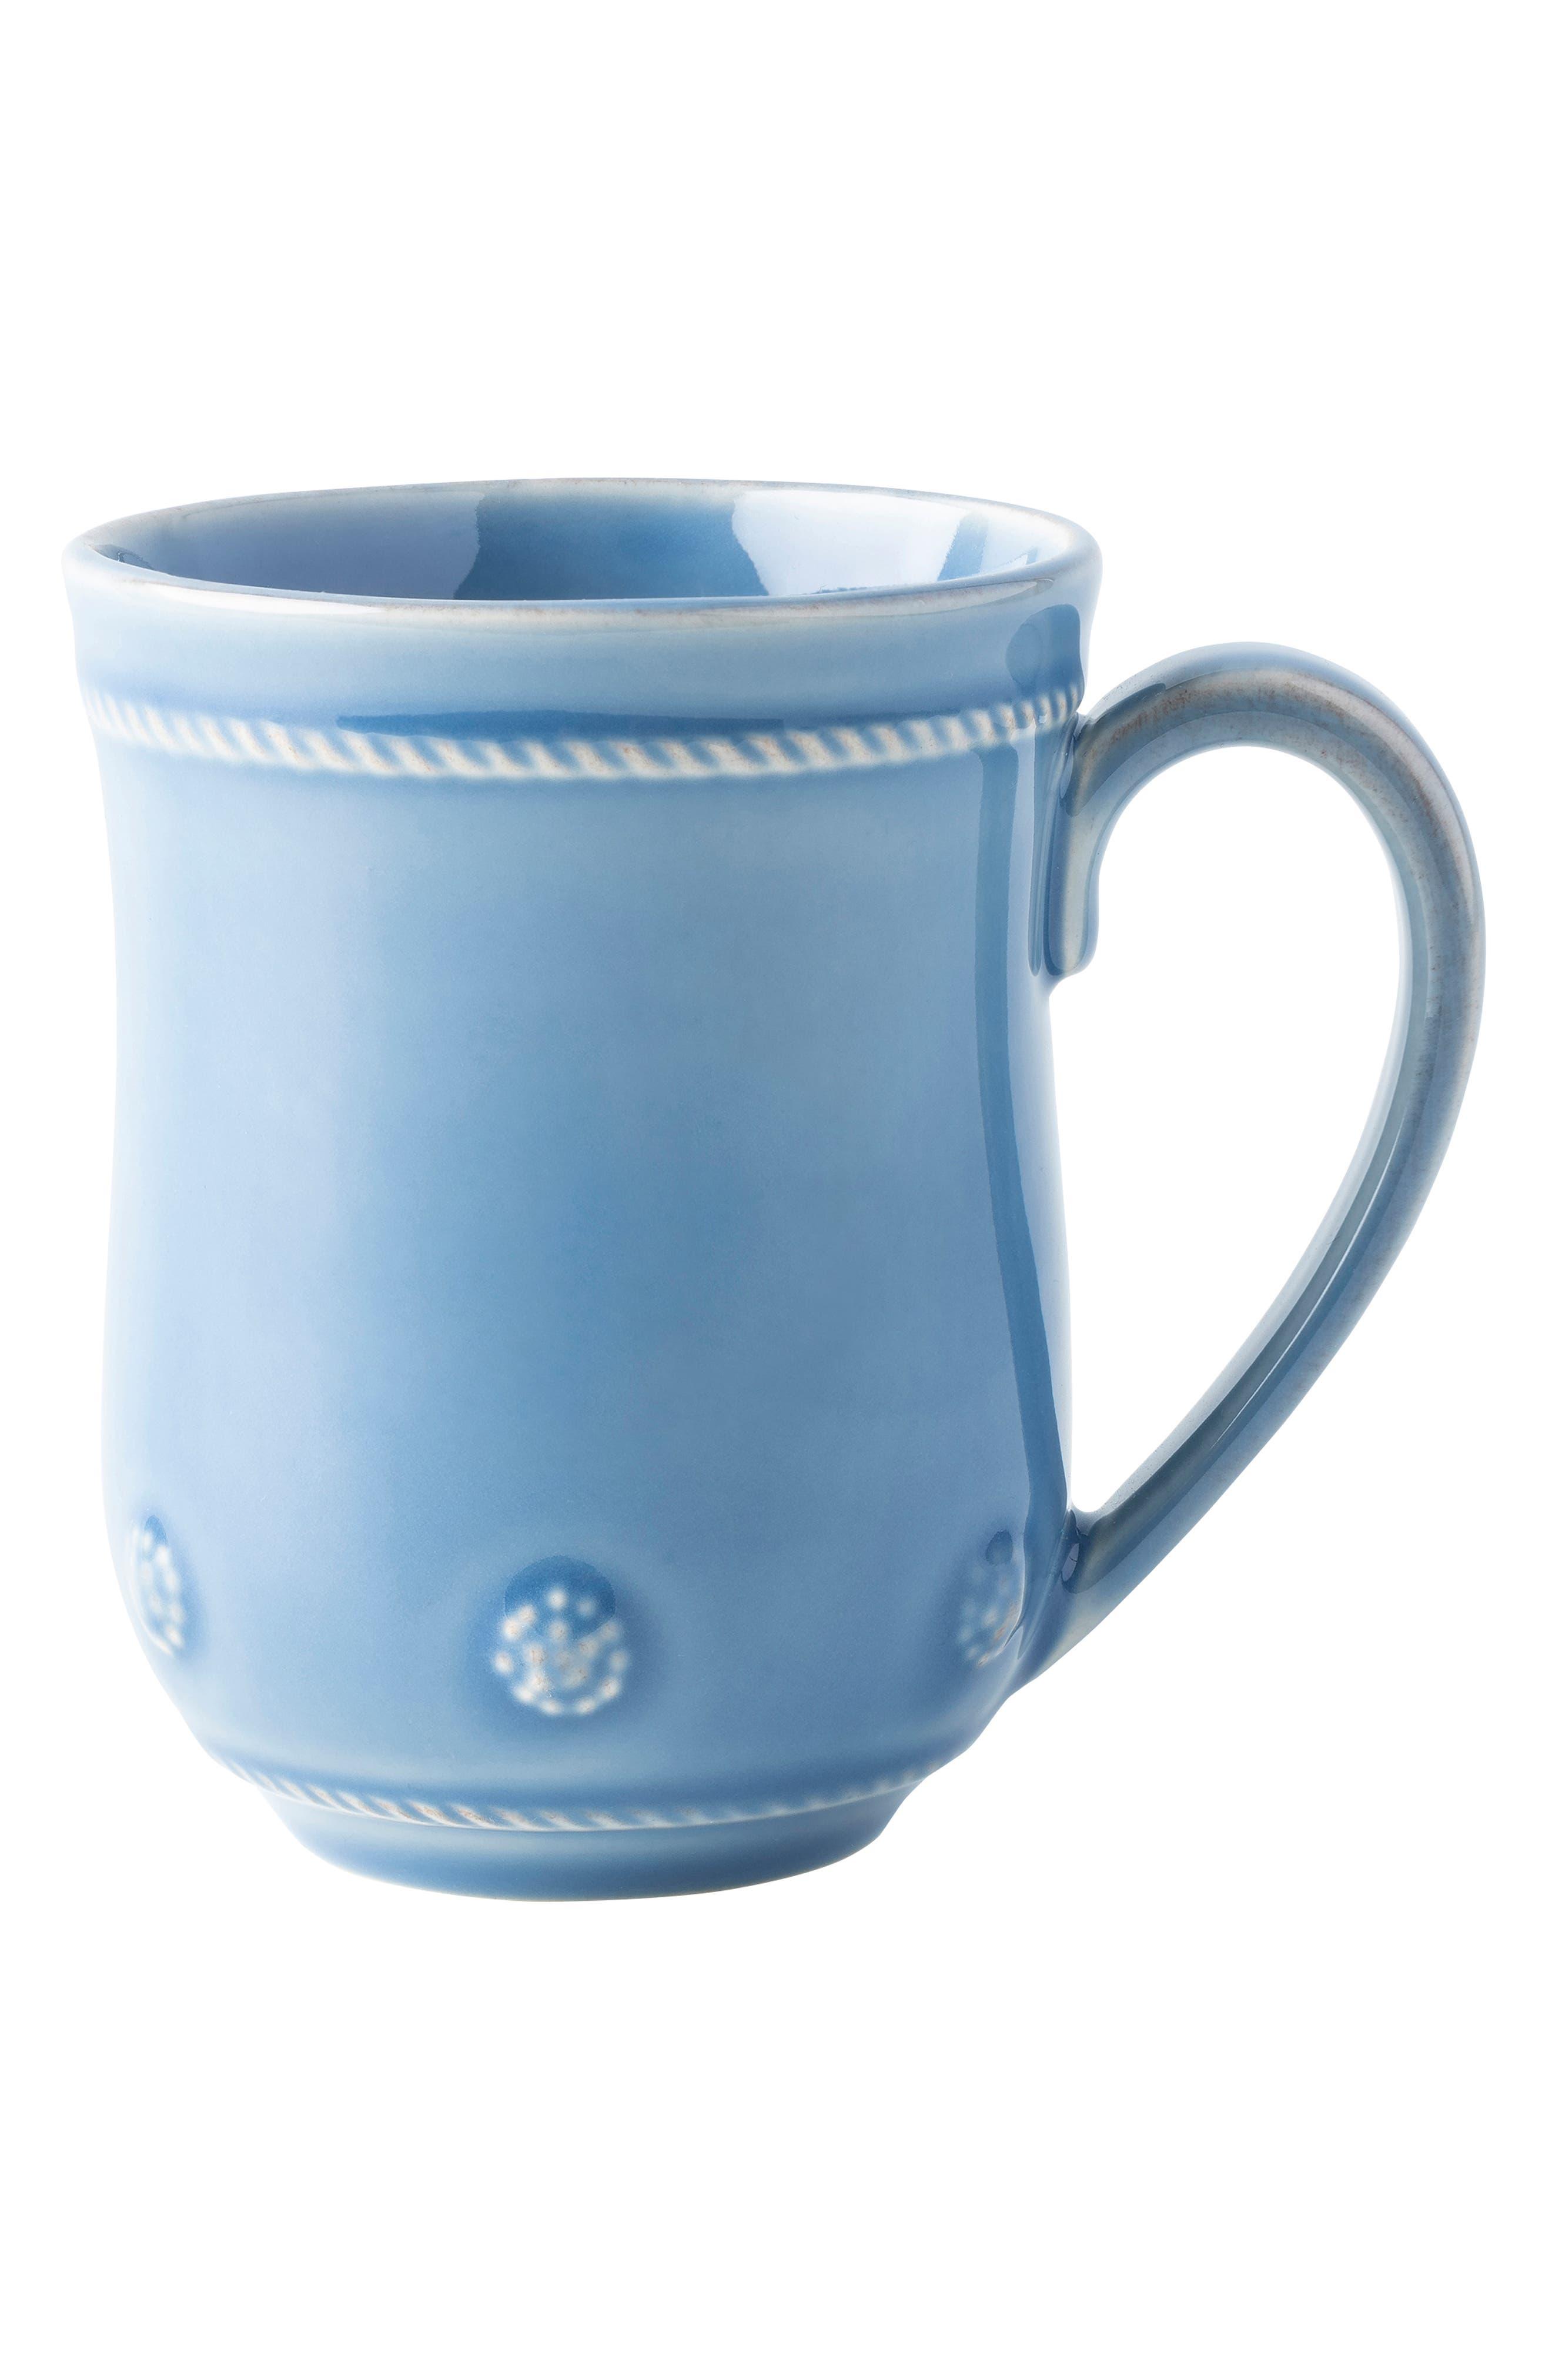 Juliska Berry And Thread Mug Size One Size  Blue